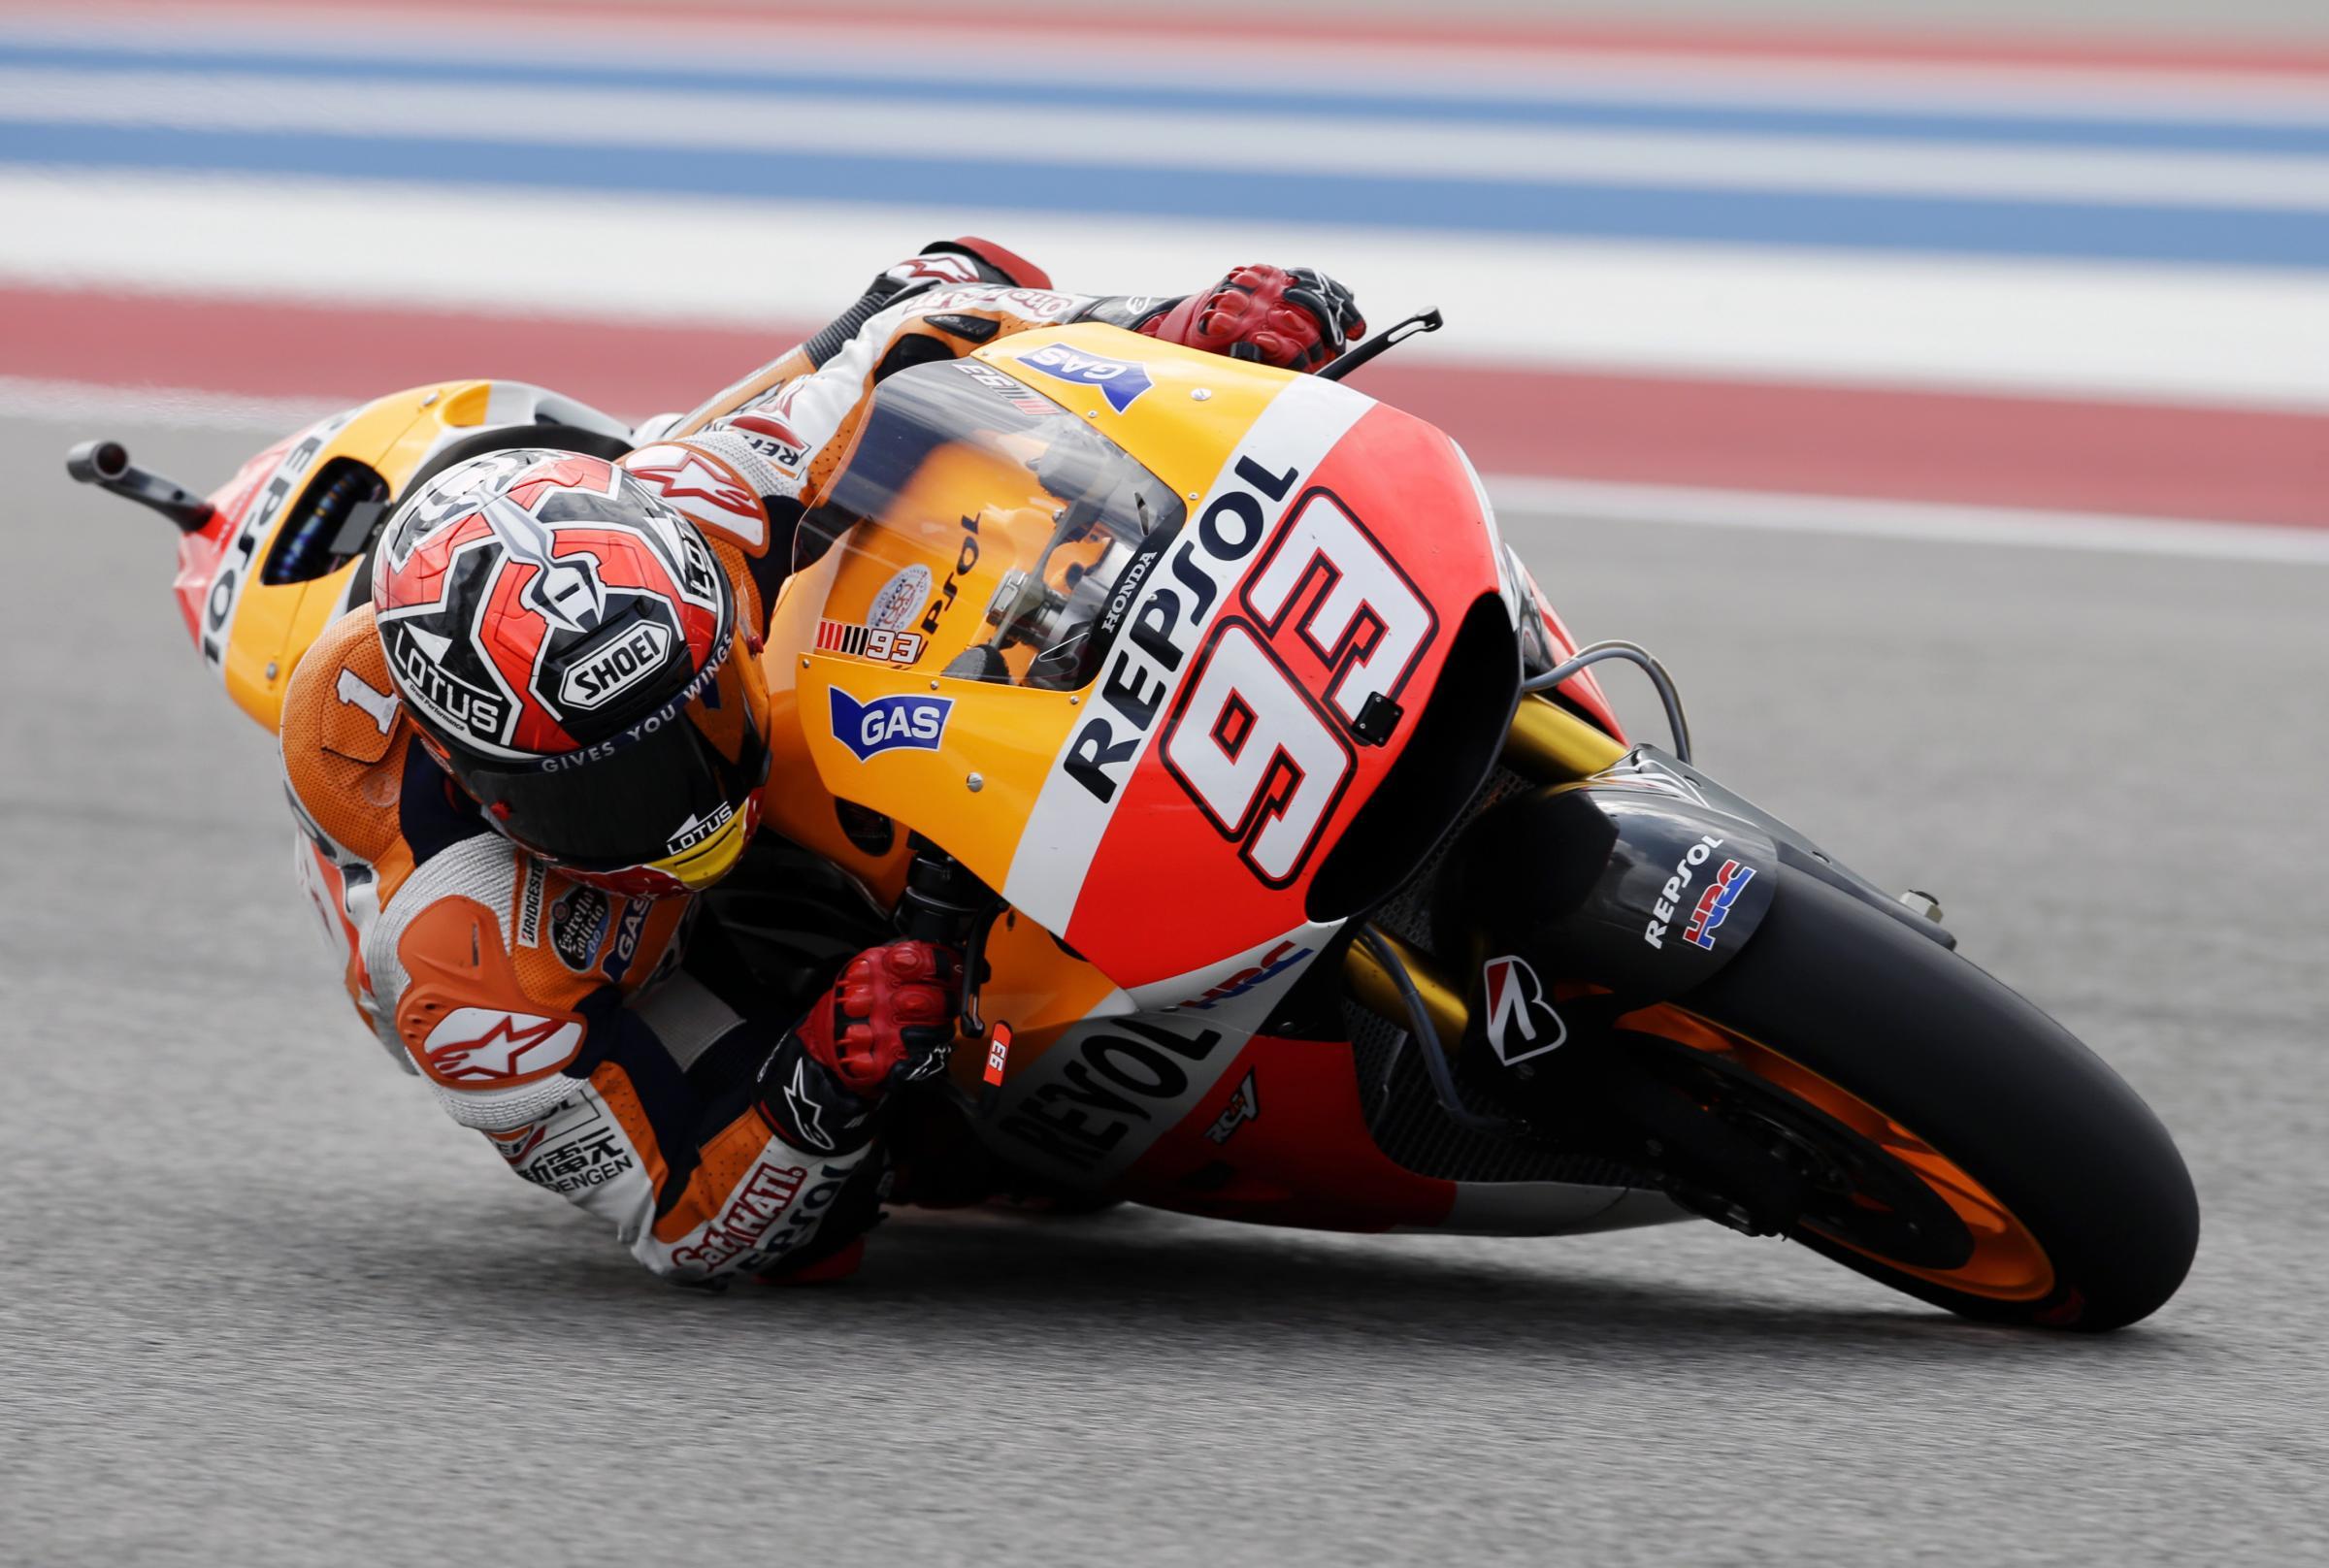 MotoGP Austin 2014, gara: Marquez dominatore, Dovizioso terzo